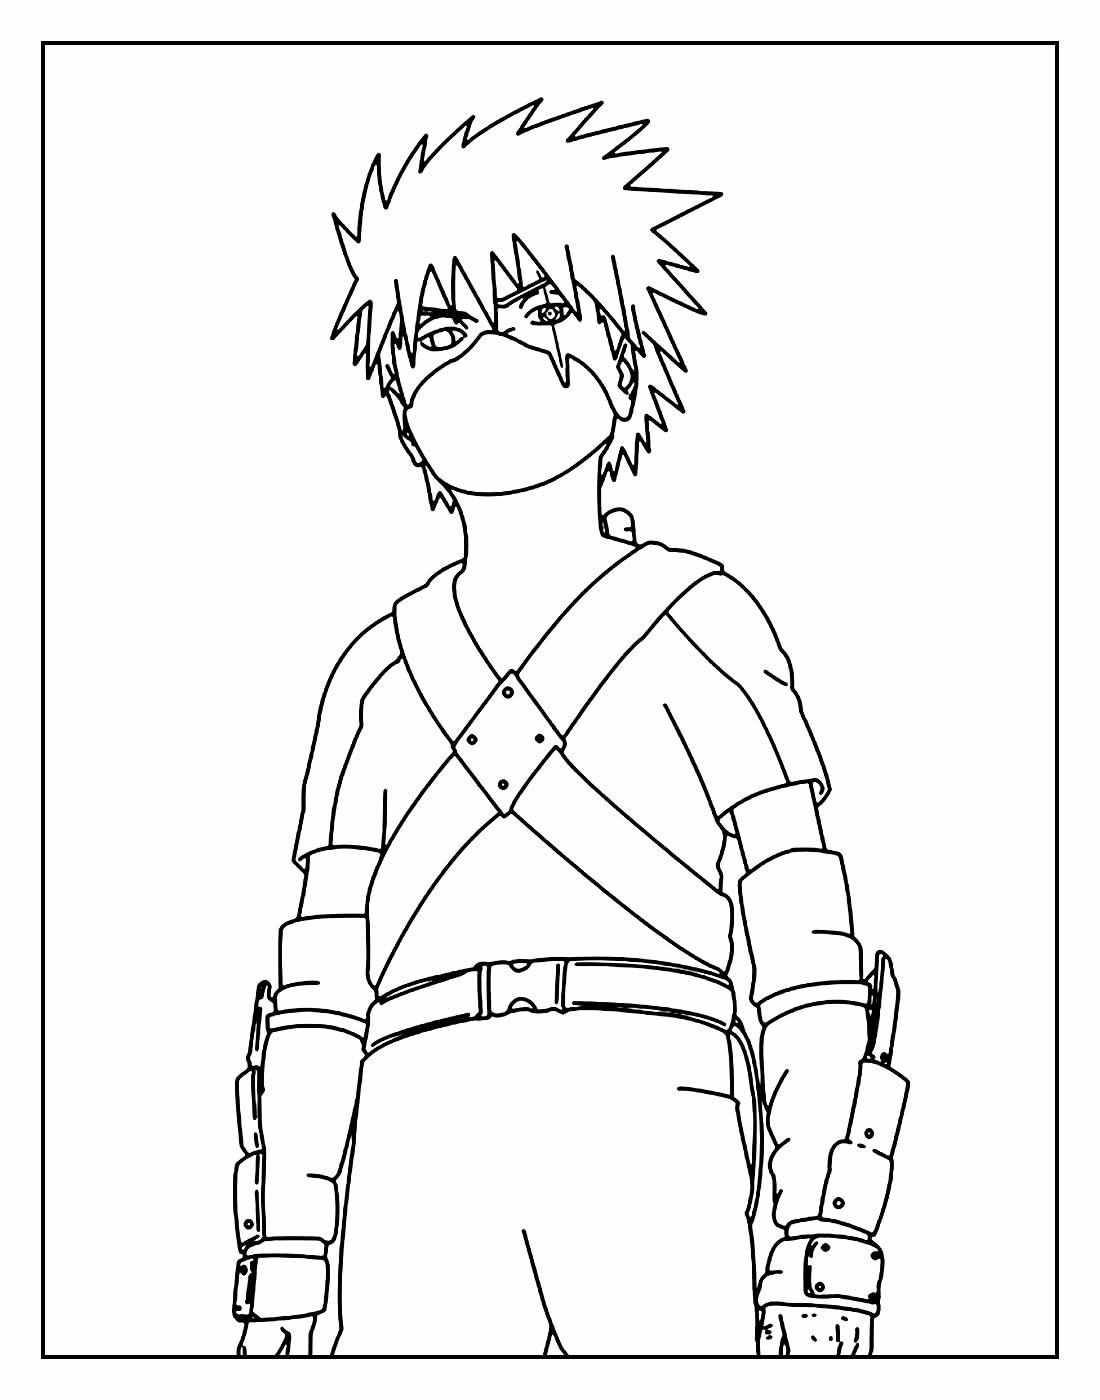 Desenho para colorir de Sasuke Uchiha